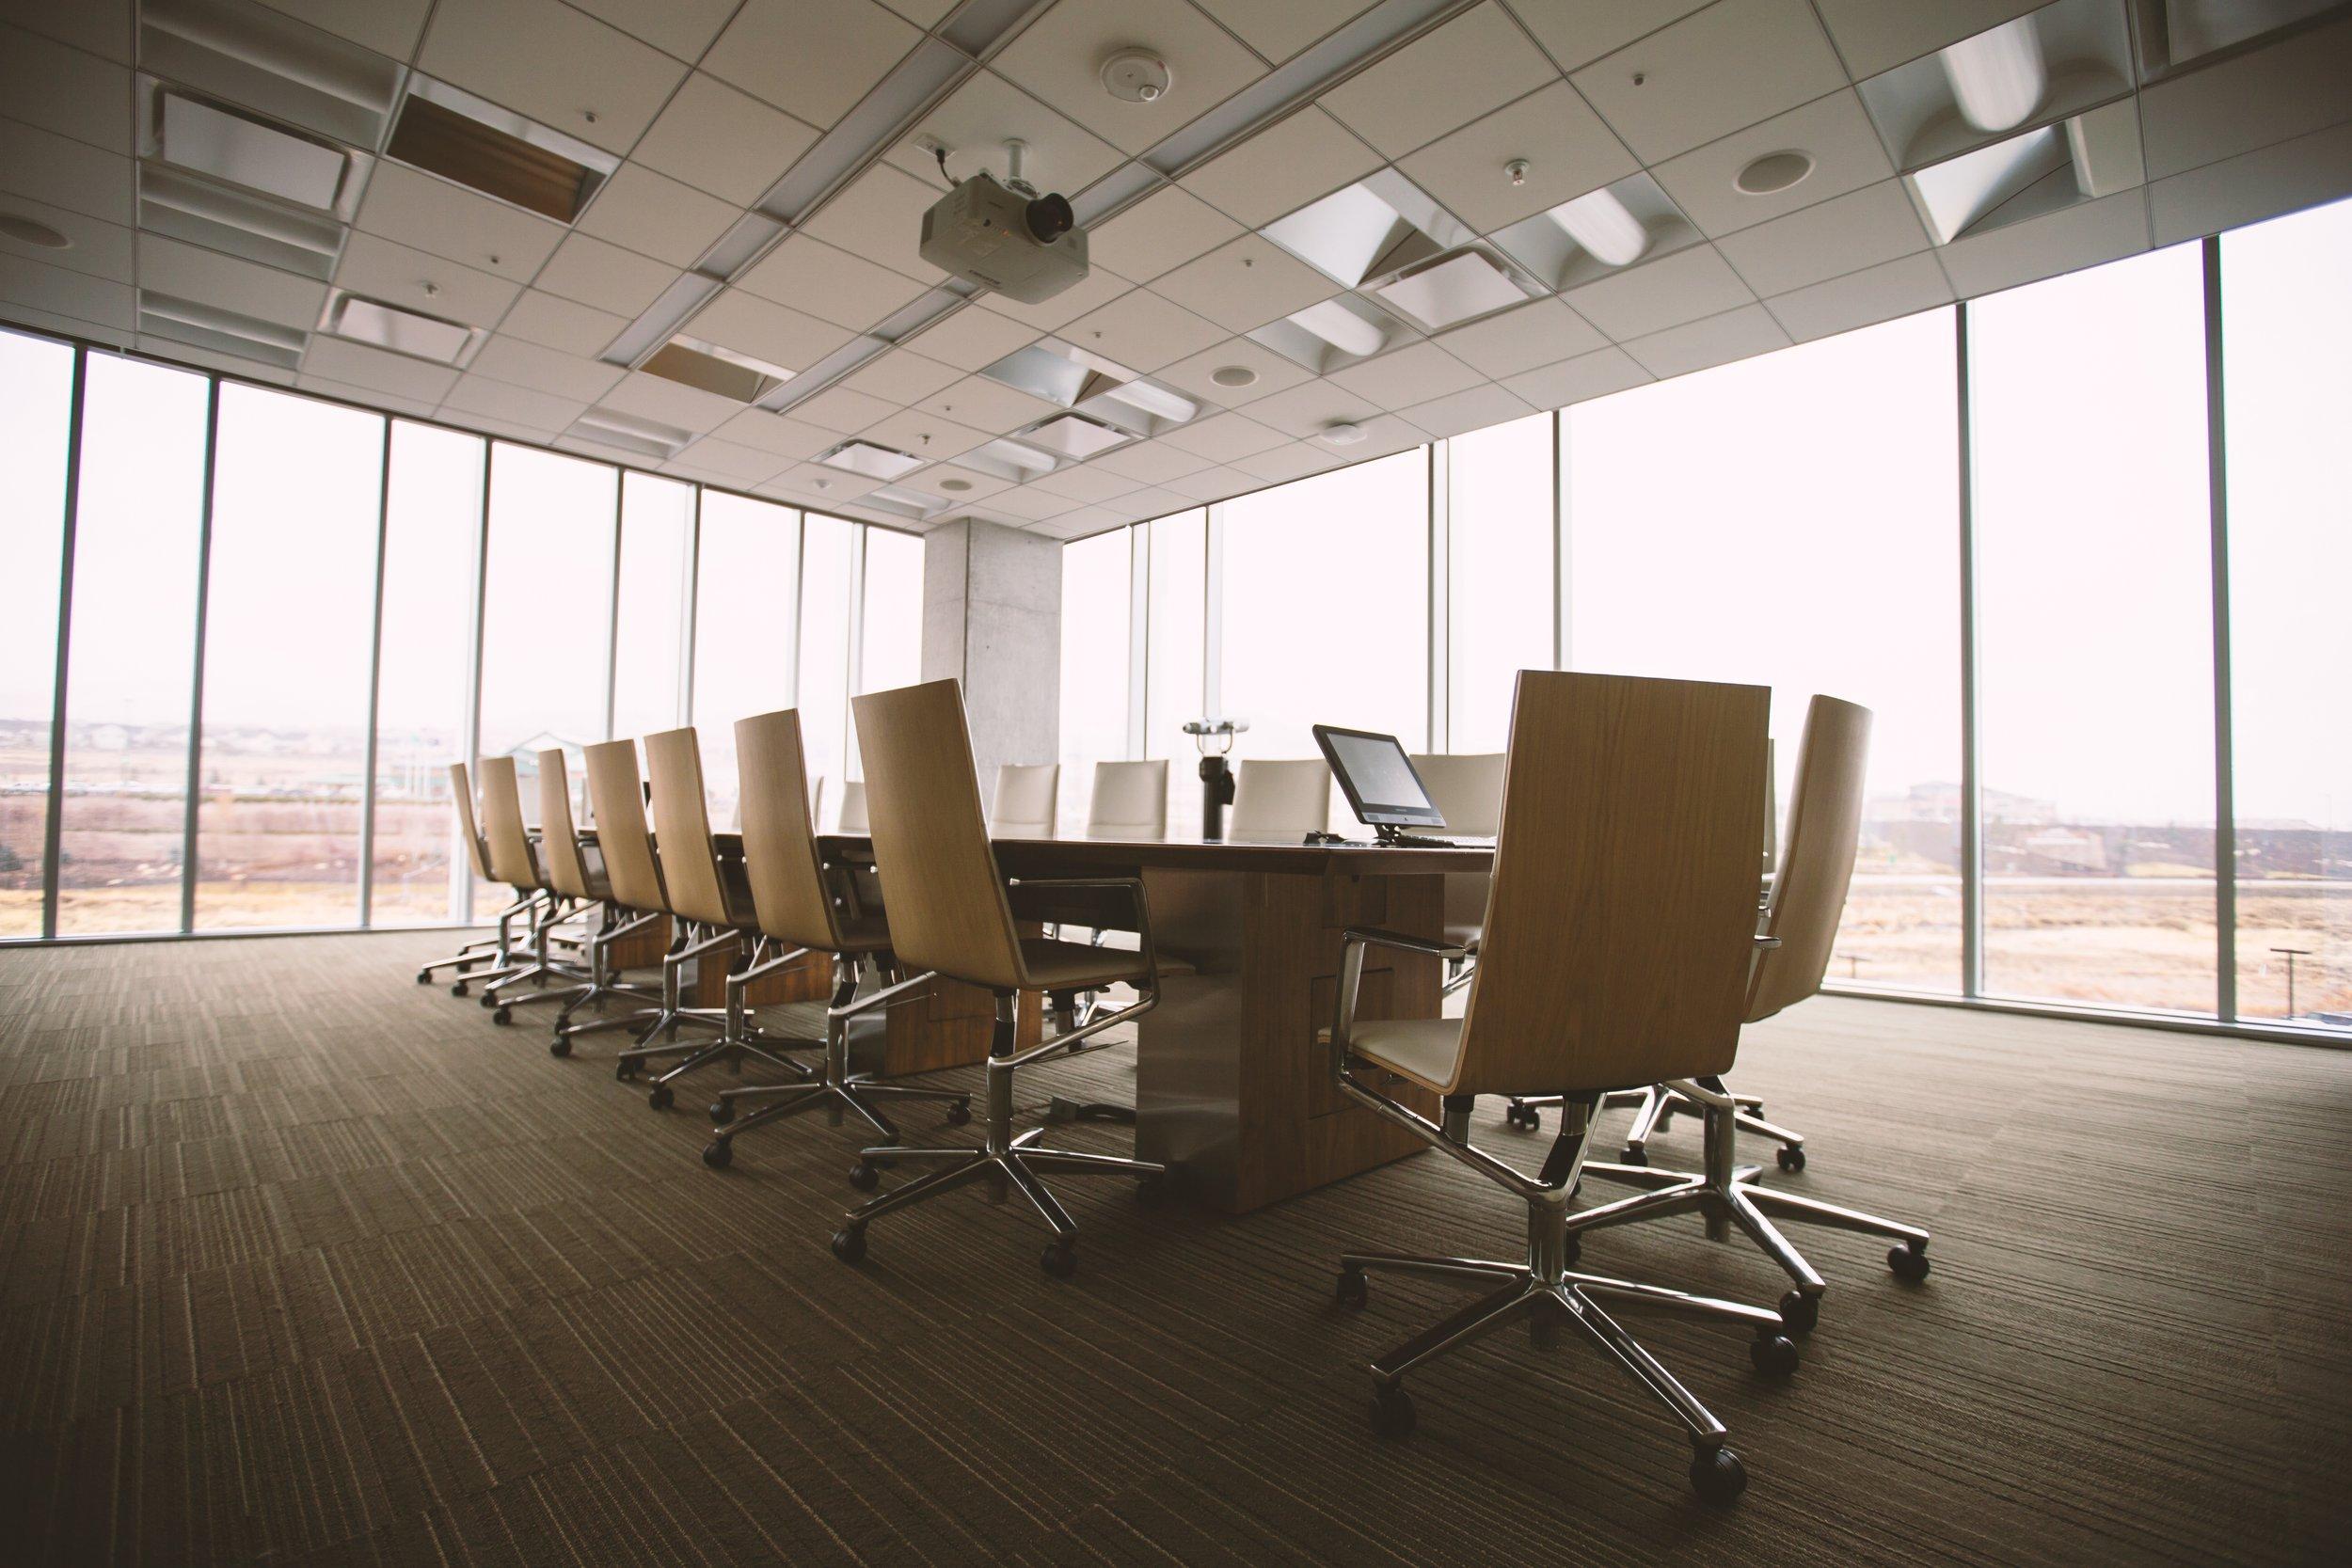 conference-room-768441.jpg